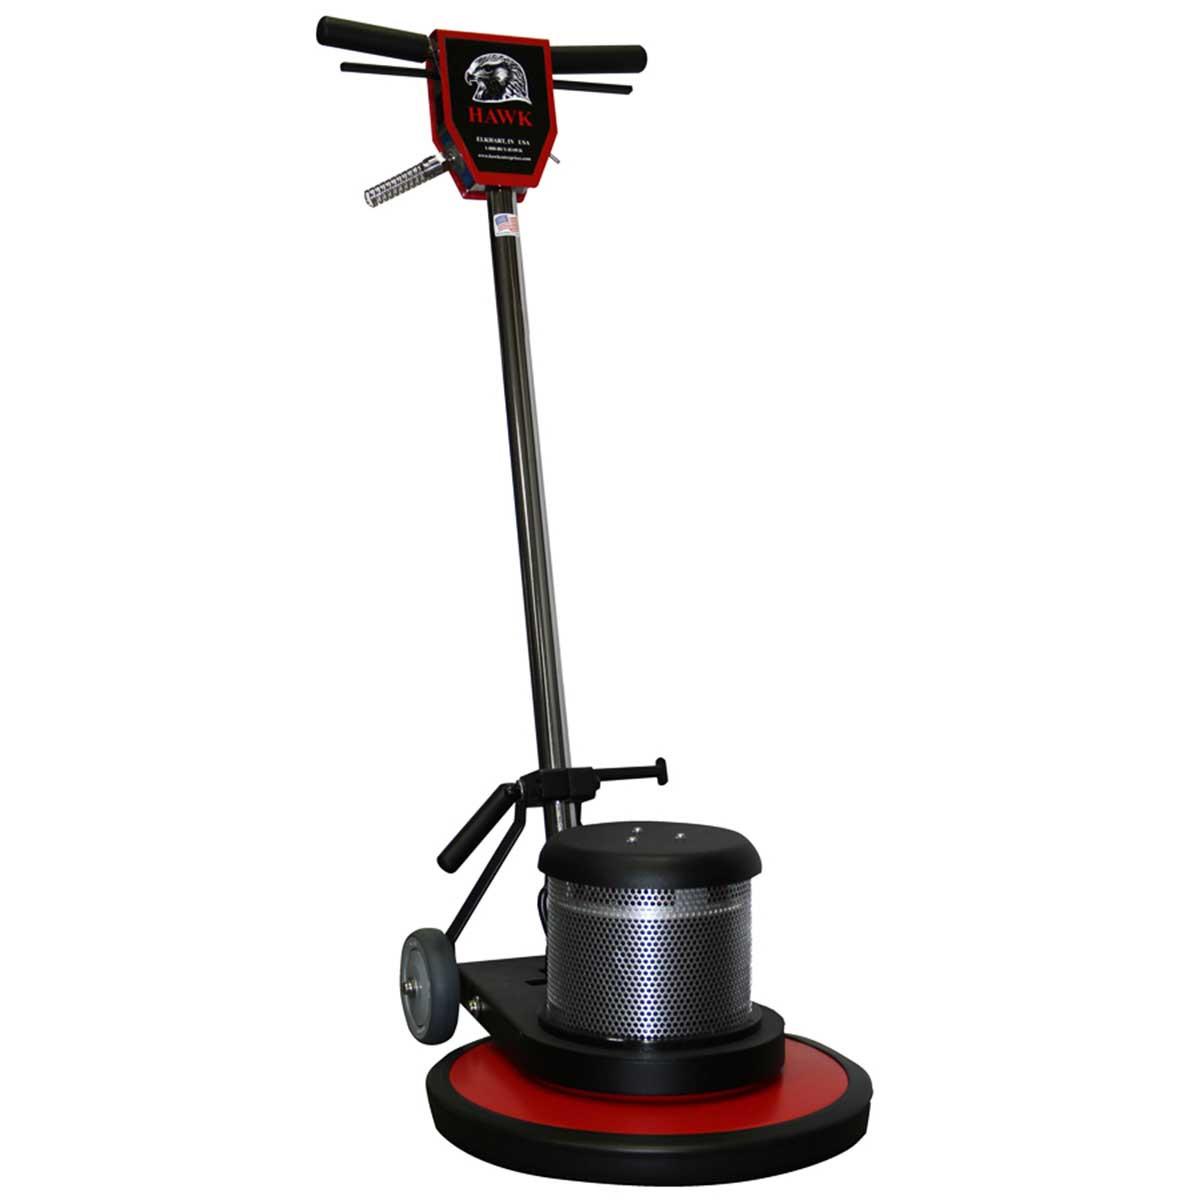 Hawk Two Speed Floor machine